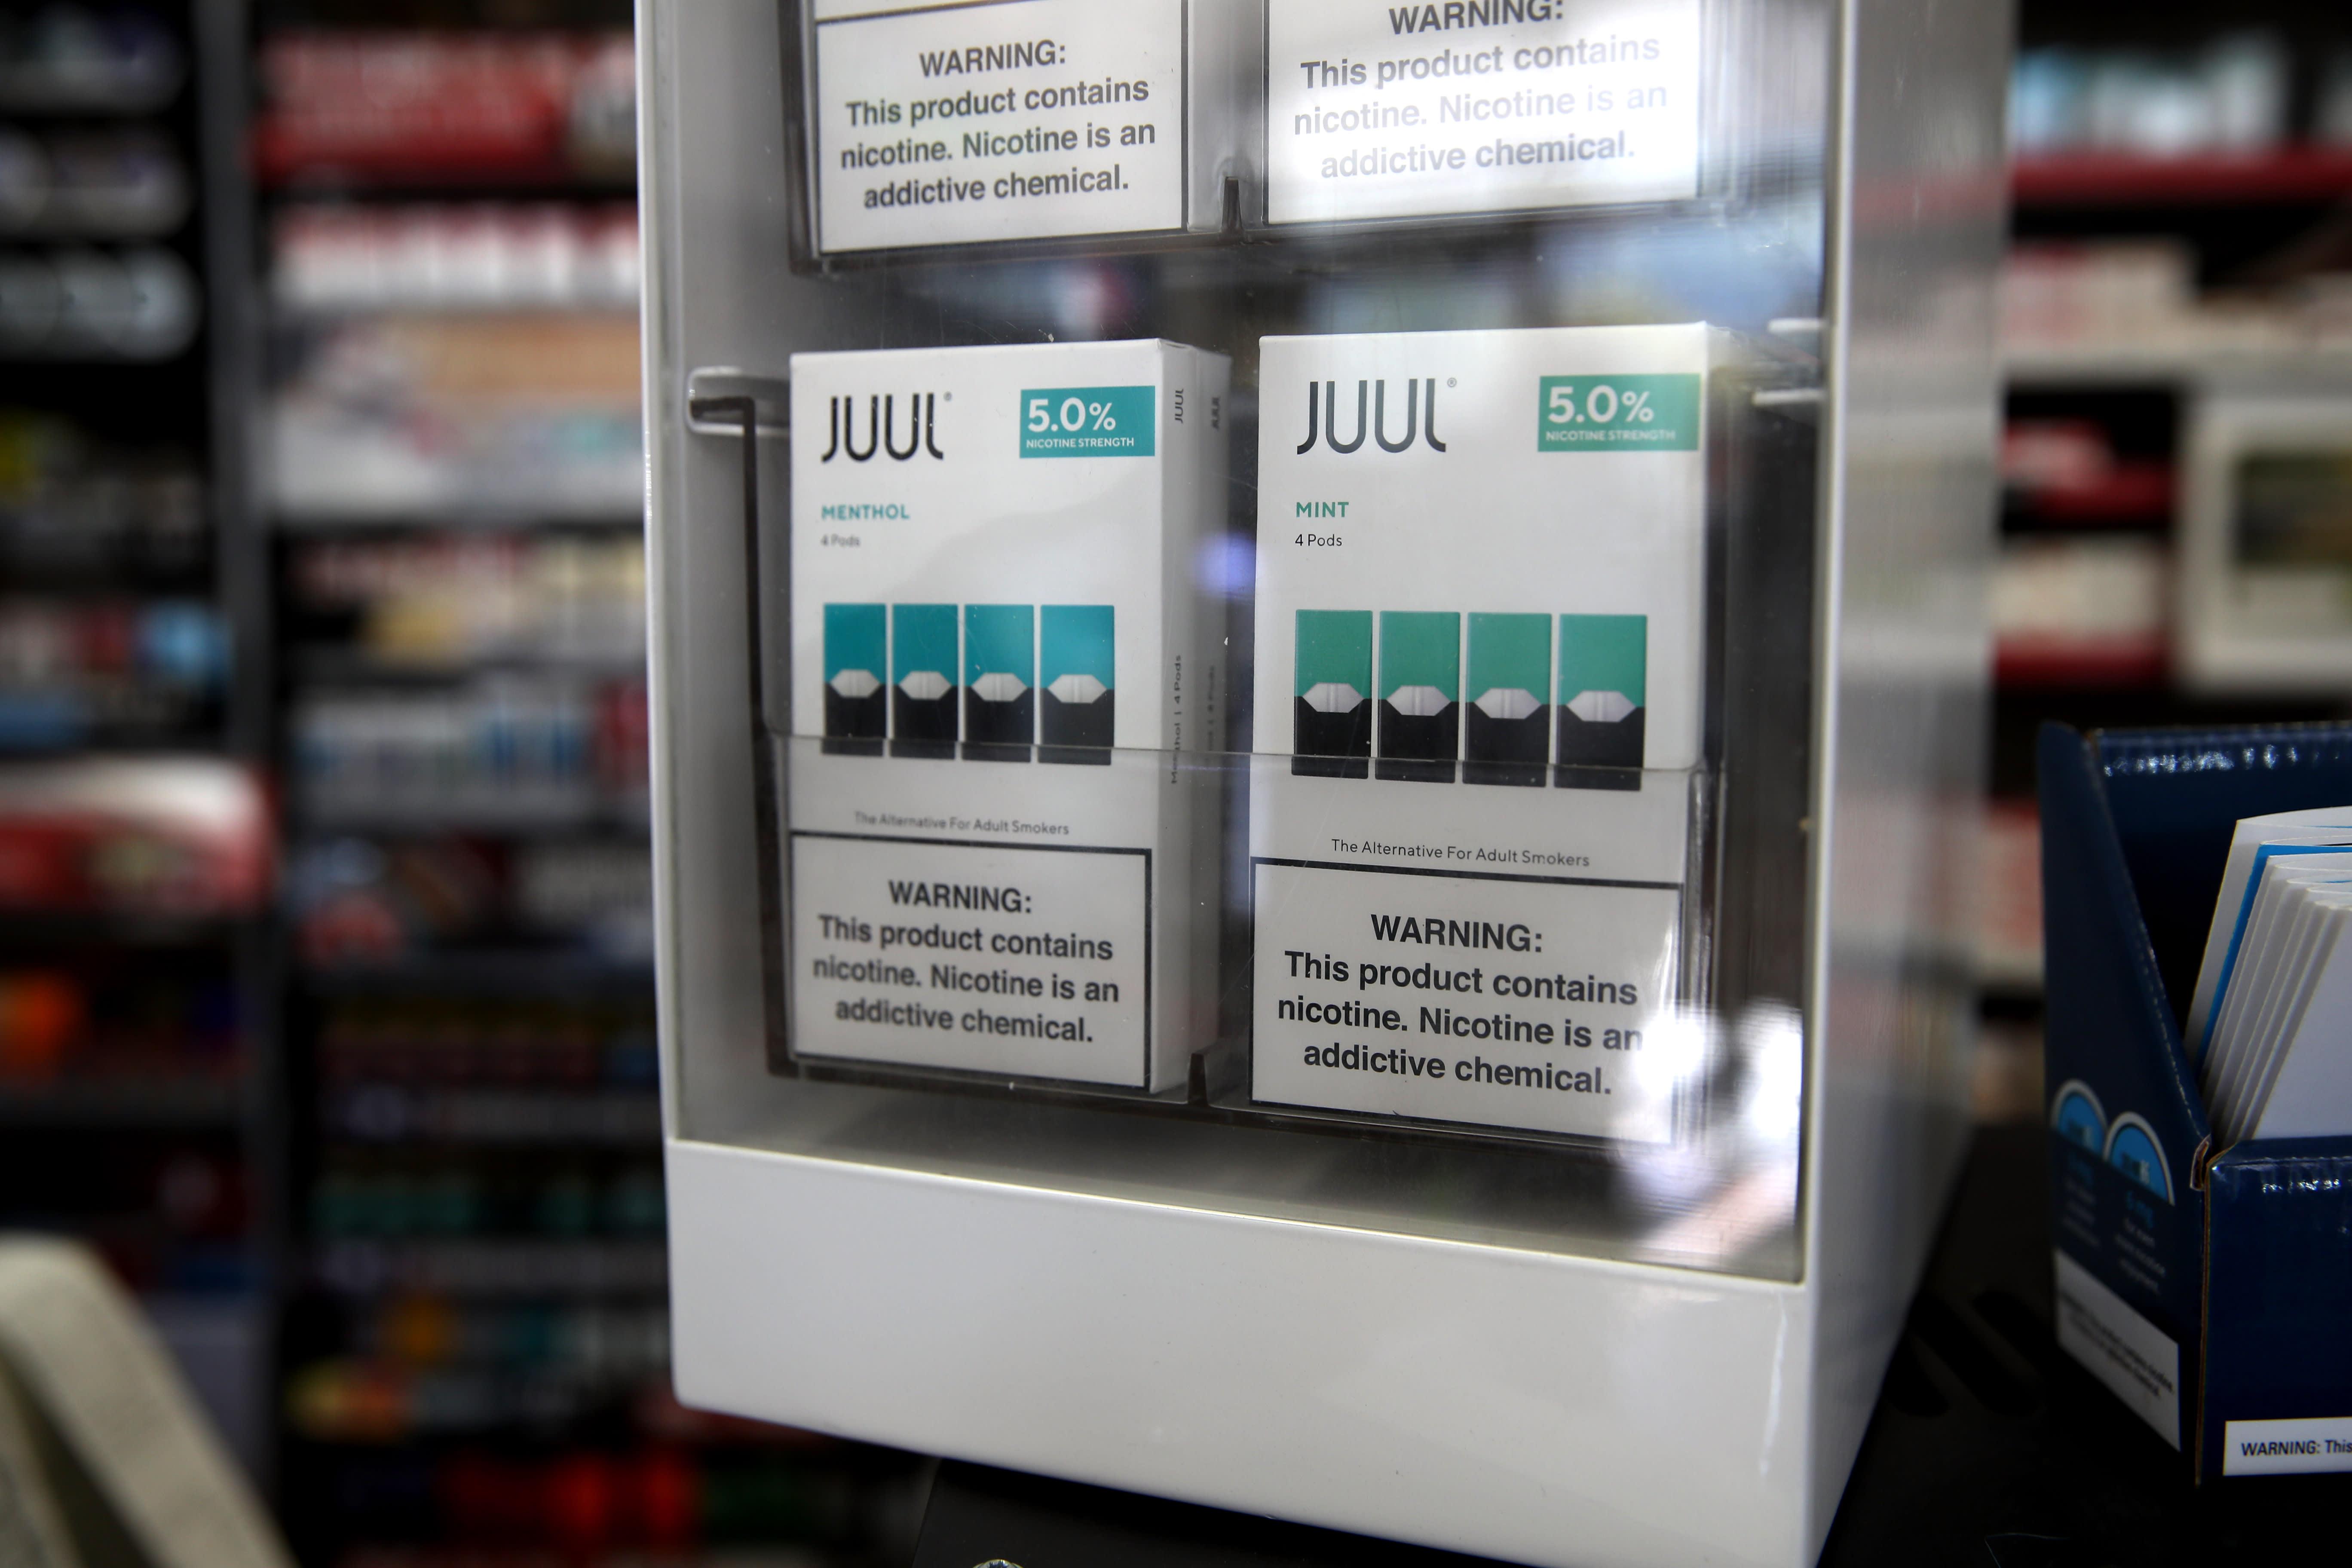 New York sues e-cigarette giant Juul